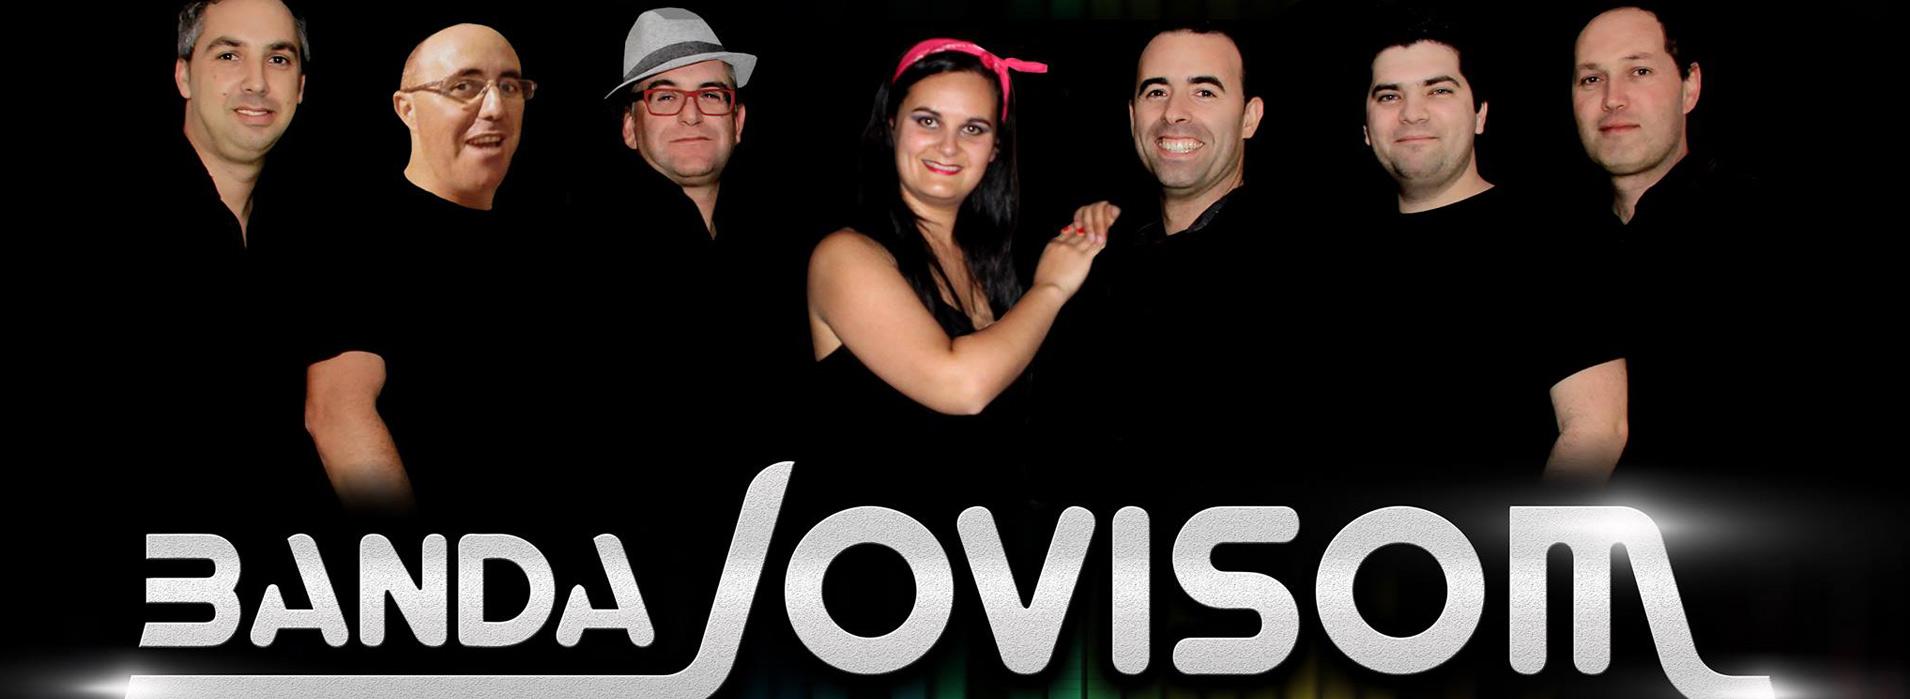 Banda Jovisom, Bandas de baile, Bandas musicais, grupos musicais de baile, conjuntos, bandas baratas, Grupos de baile, animação, festas, contactos de artistas, contactos de bandas, contactos de grupos musicais